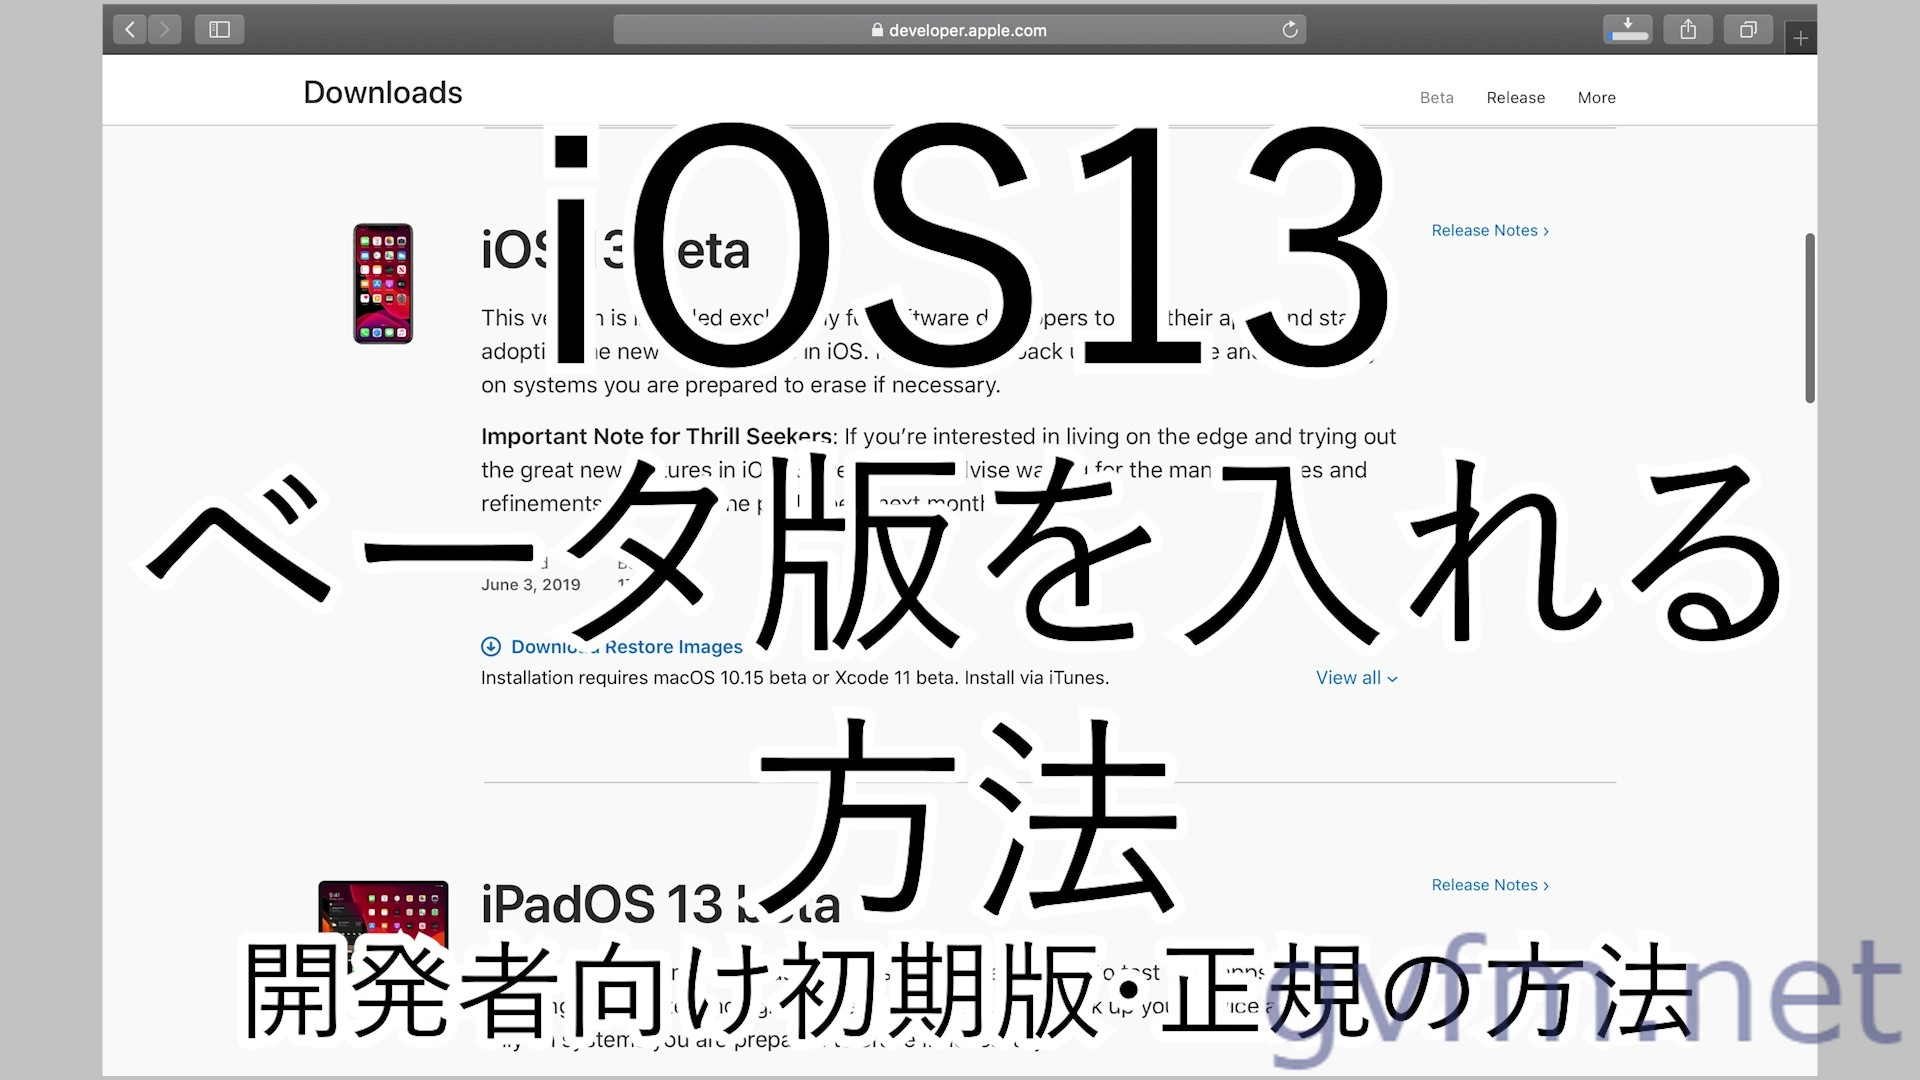 iOS13ベータ版をインストールする方法 入れ方